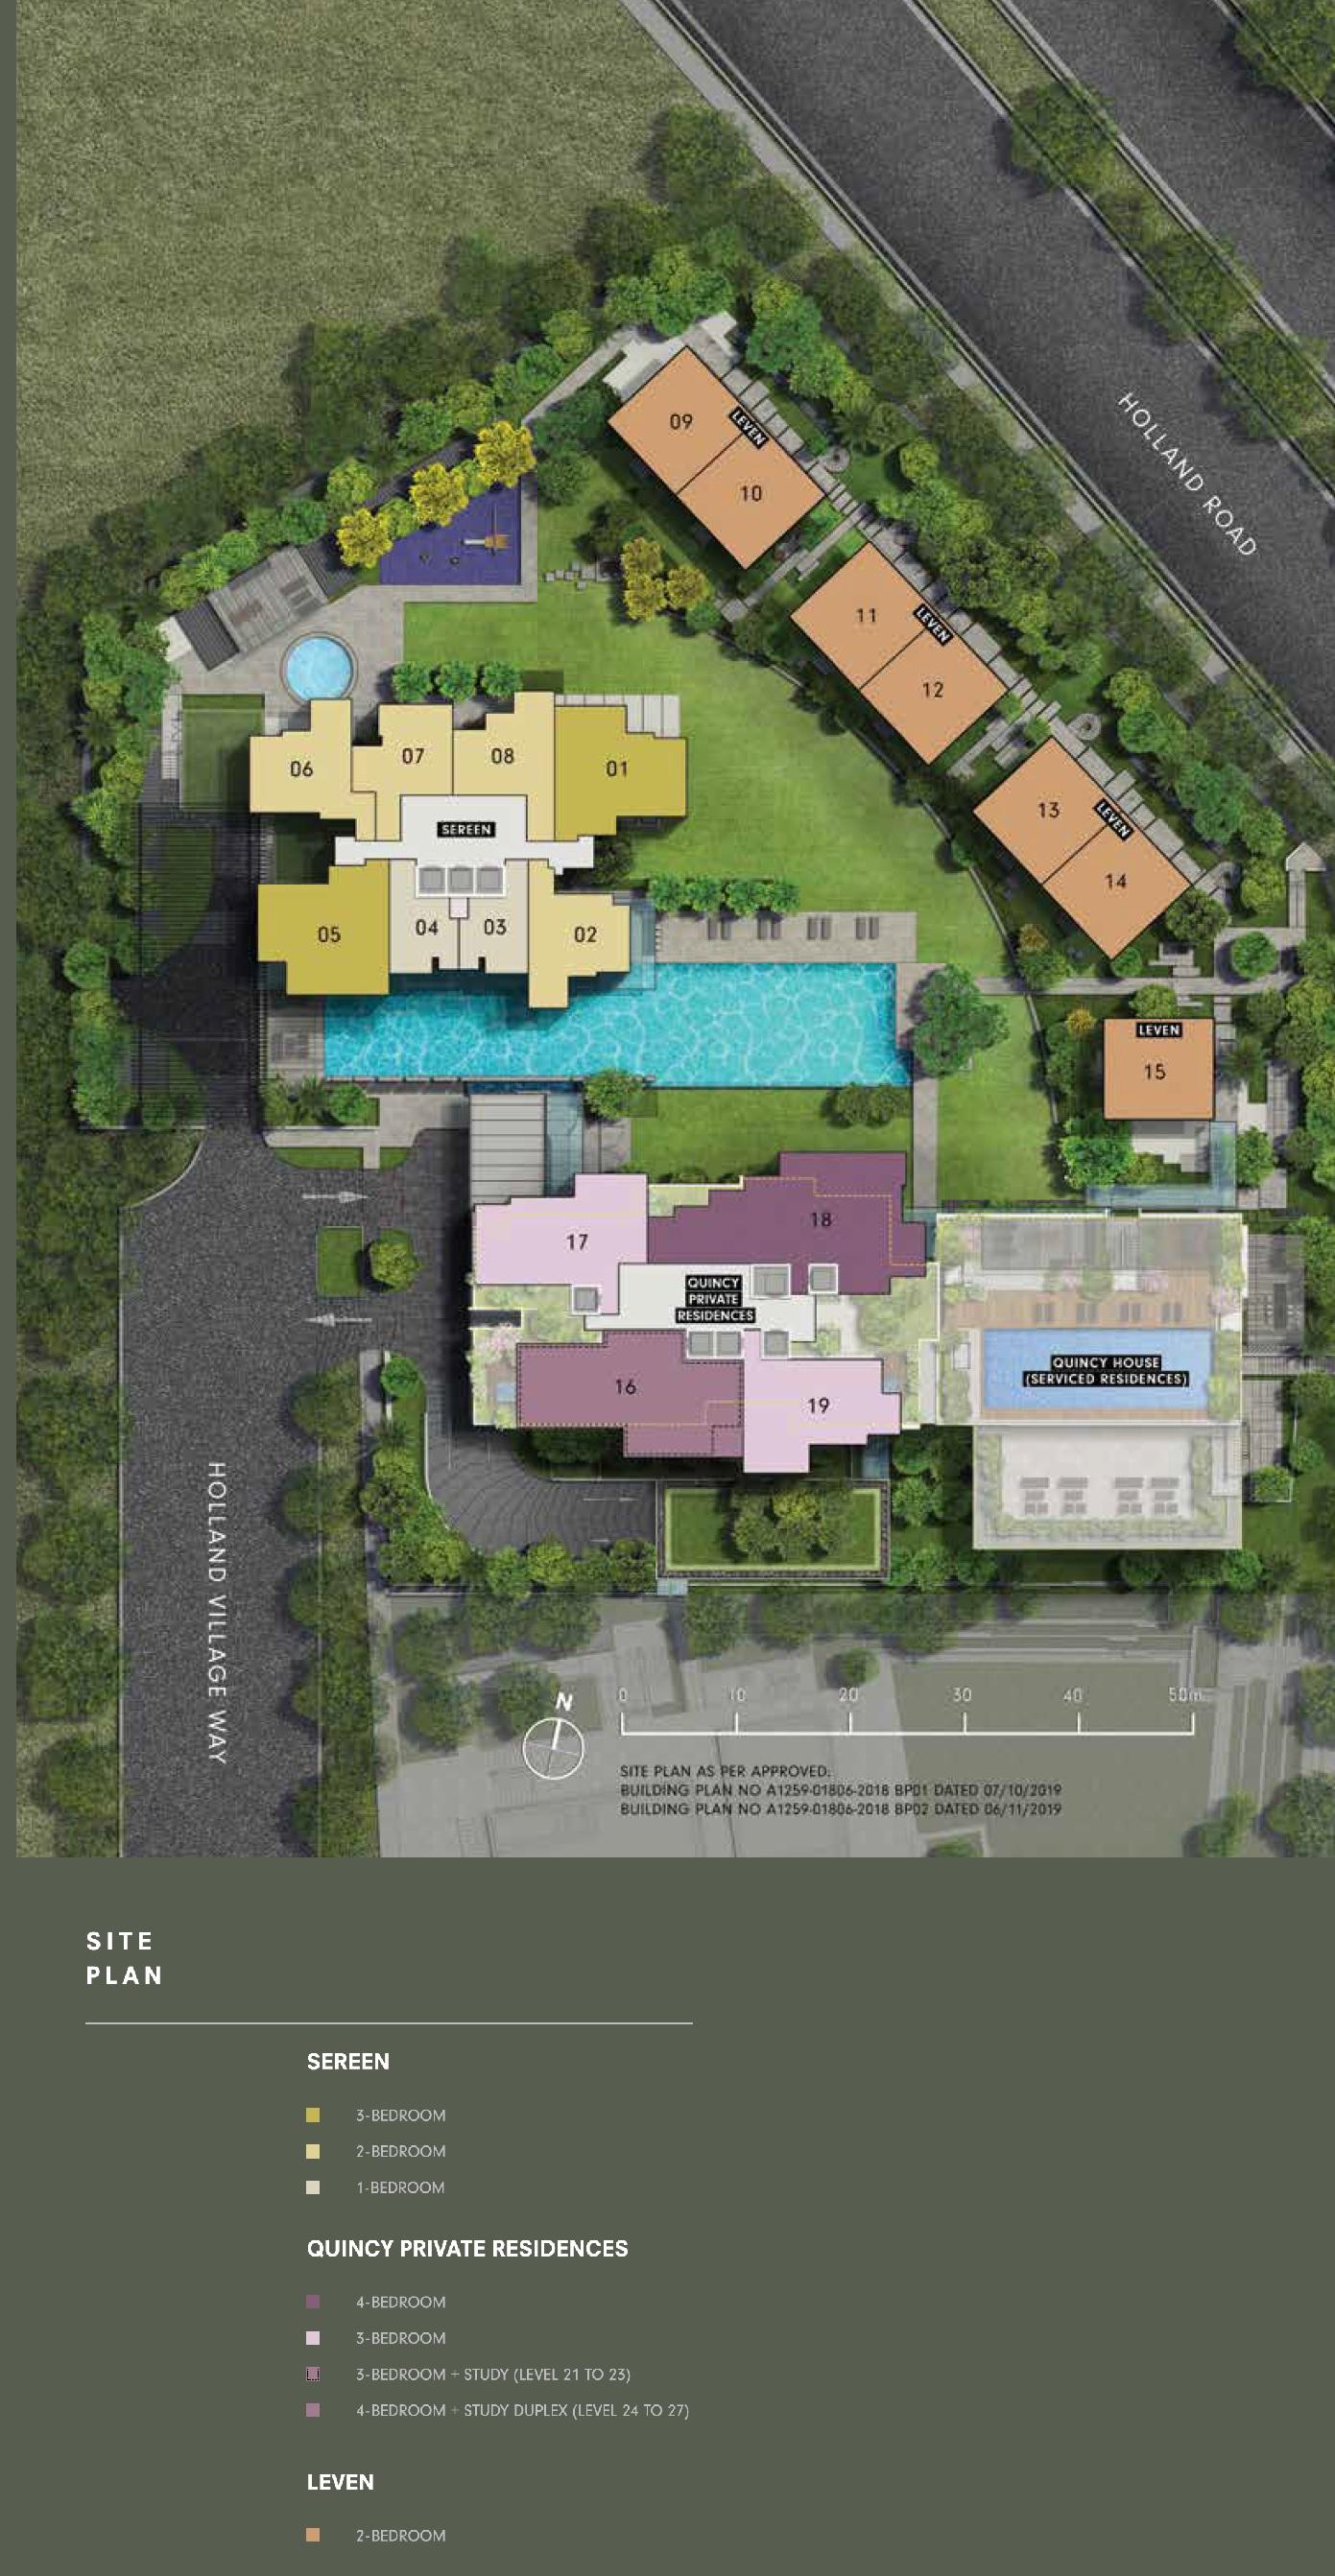 Site Plans One Holland Village Residences